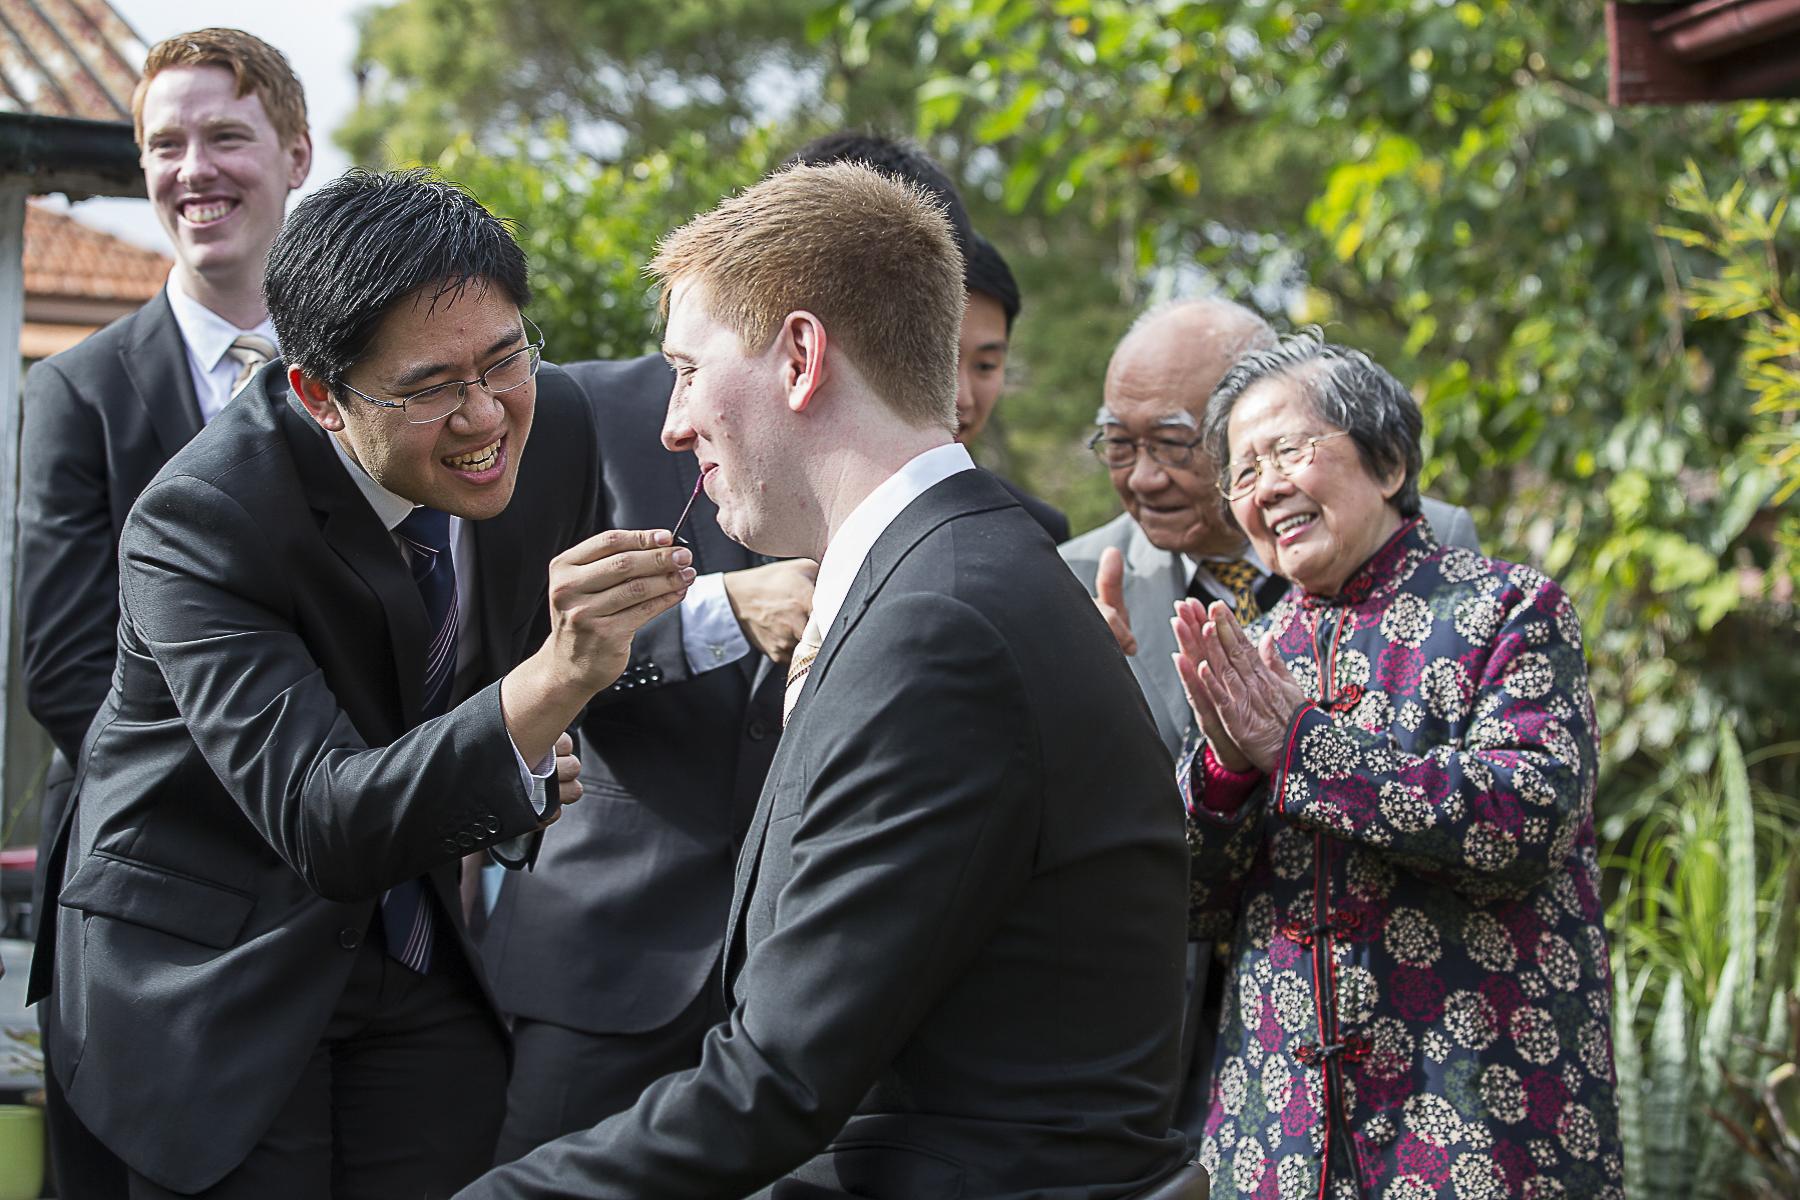 Wedding Photography Bridal party Asian Door Games | Fantasie Photography